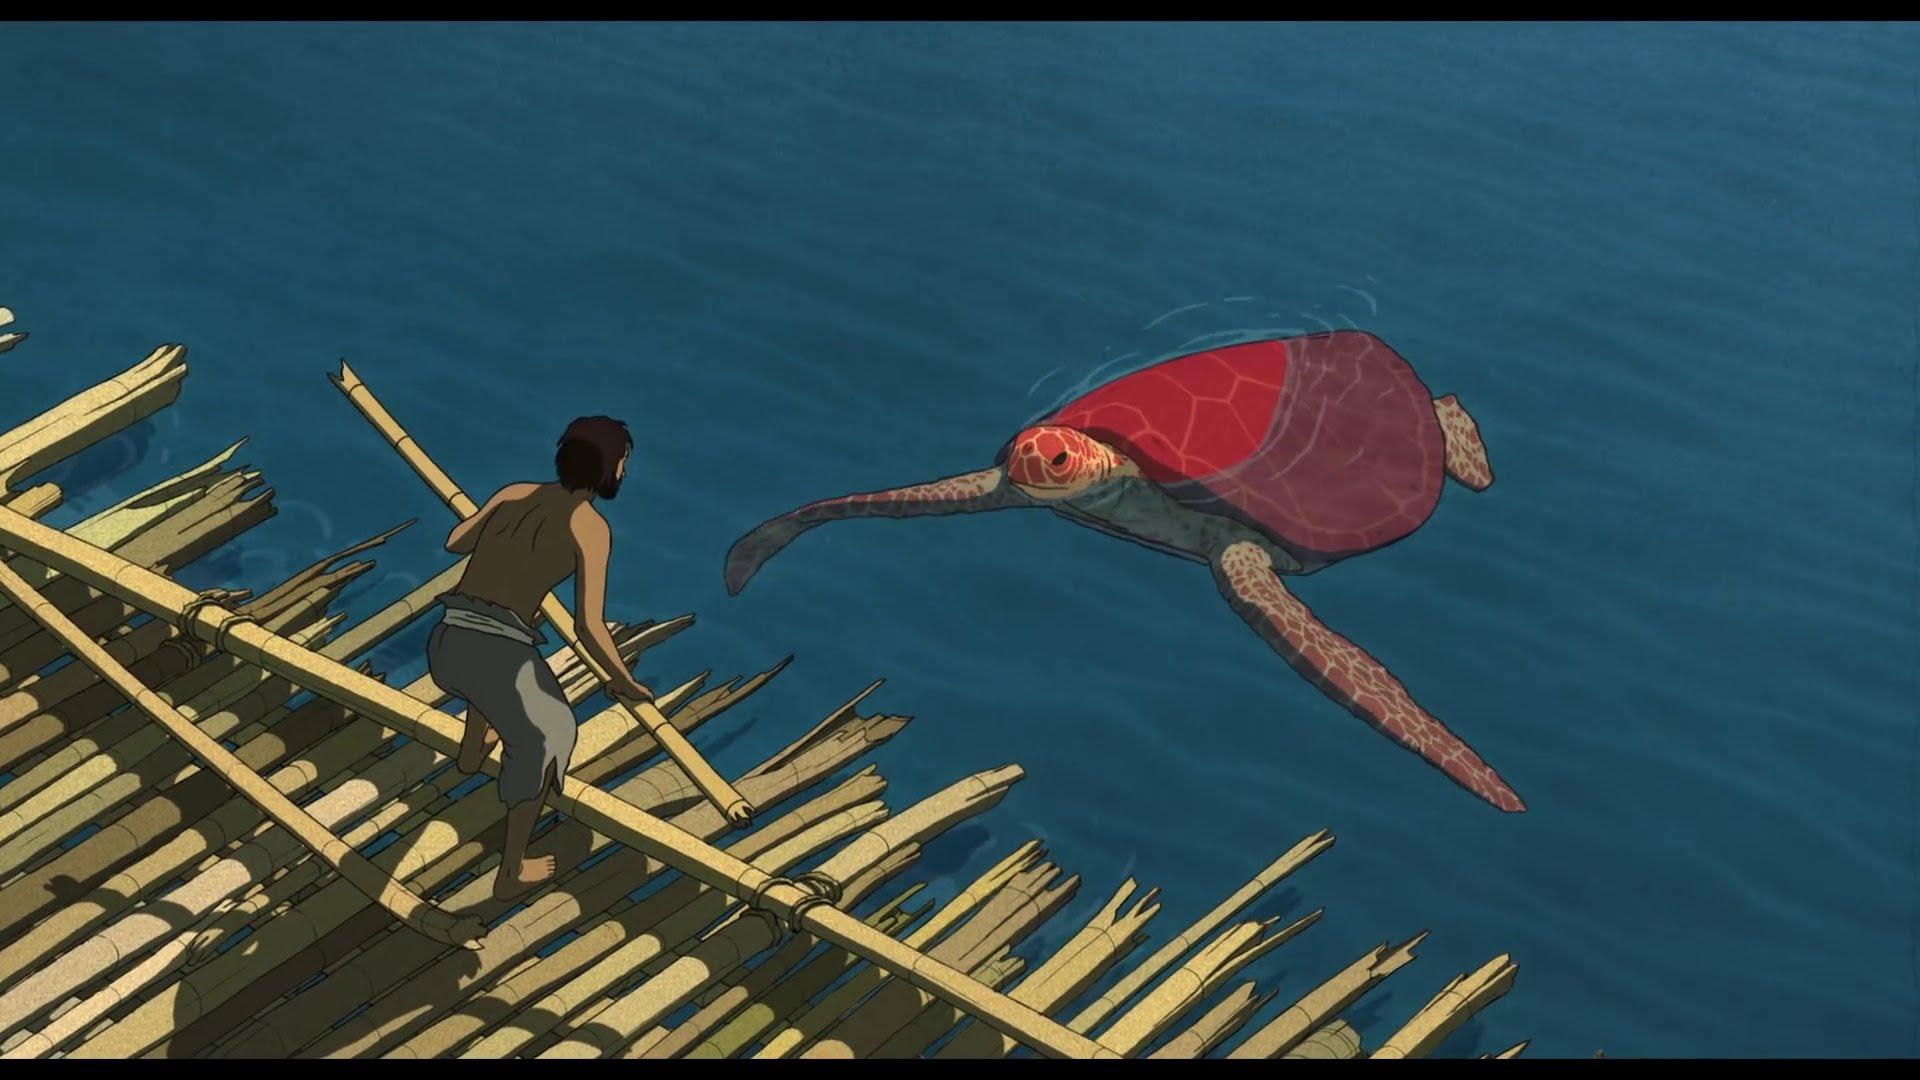 (The Red Turtle, Studio Ghibli)